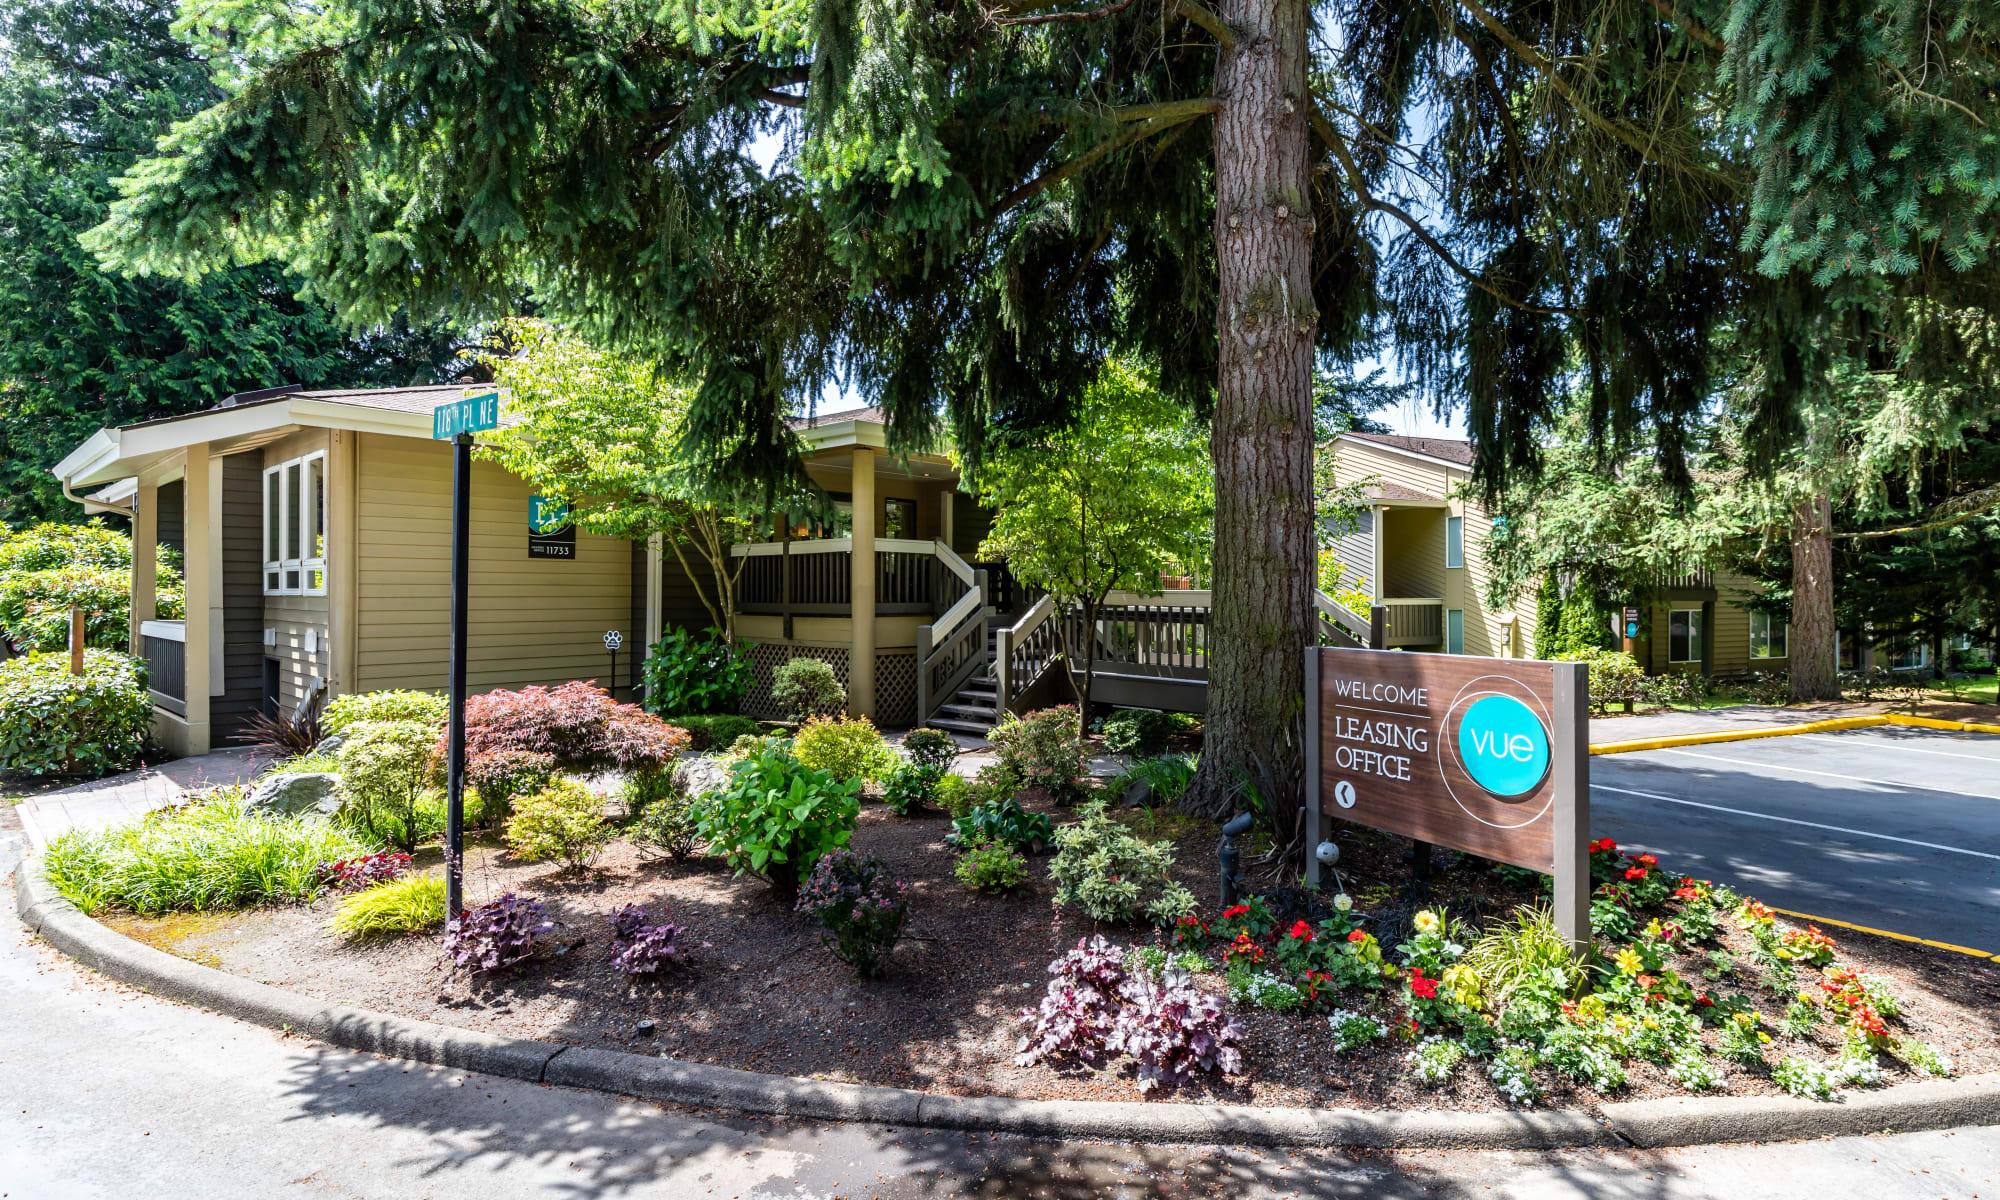 Apply at Vue Kirkland Apartments in Kirkland, Washington